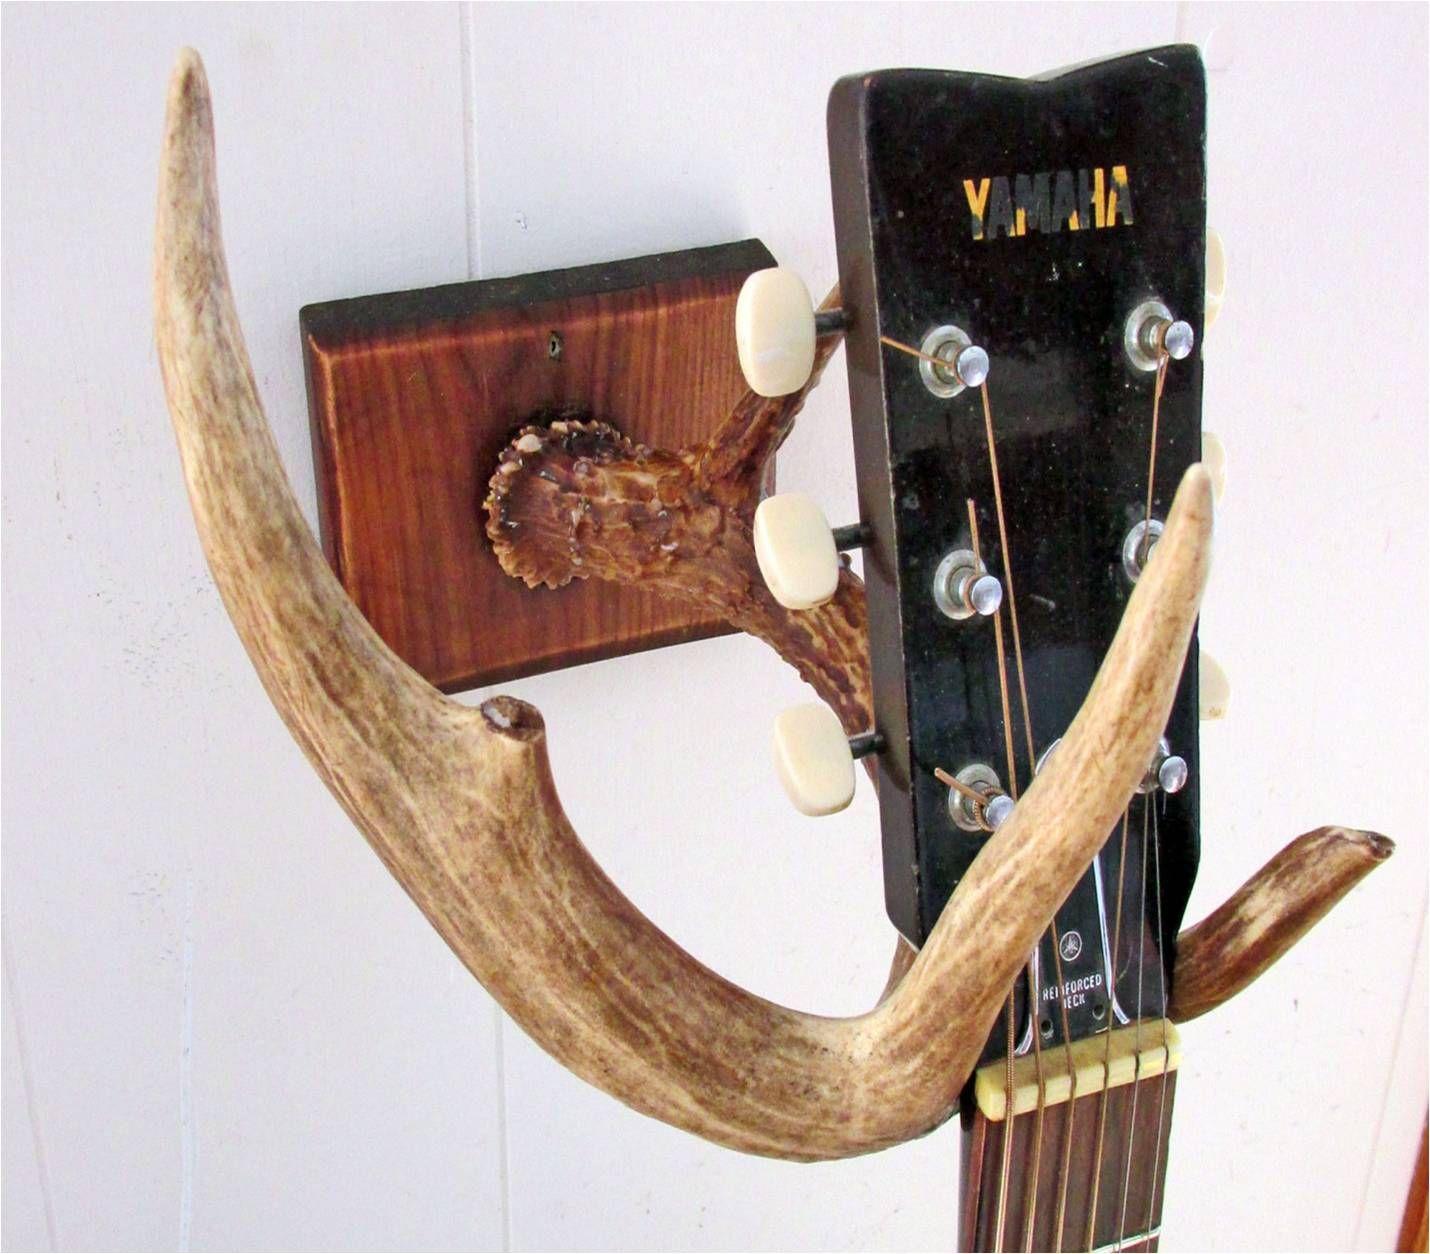 diy guitar wall mount made from deer antler projects in 2019 guitar wall guitar wall hanger. Black Bedroom Furniture Sets. Home Design Ideas